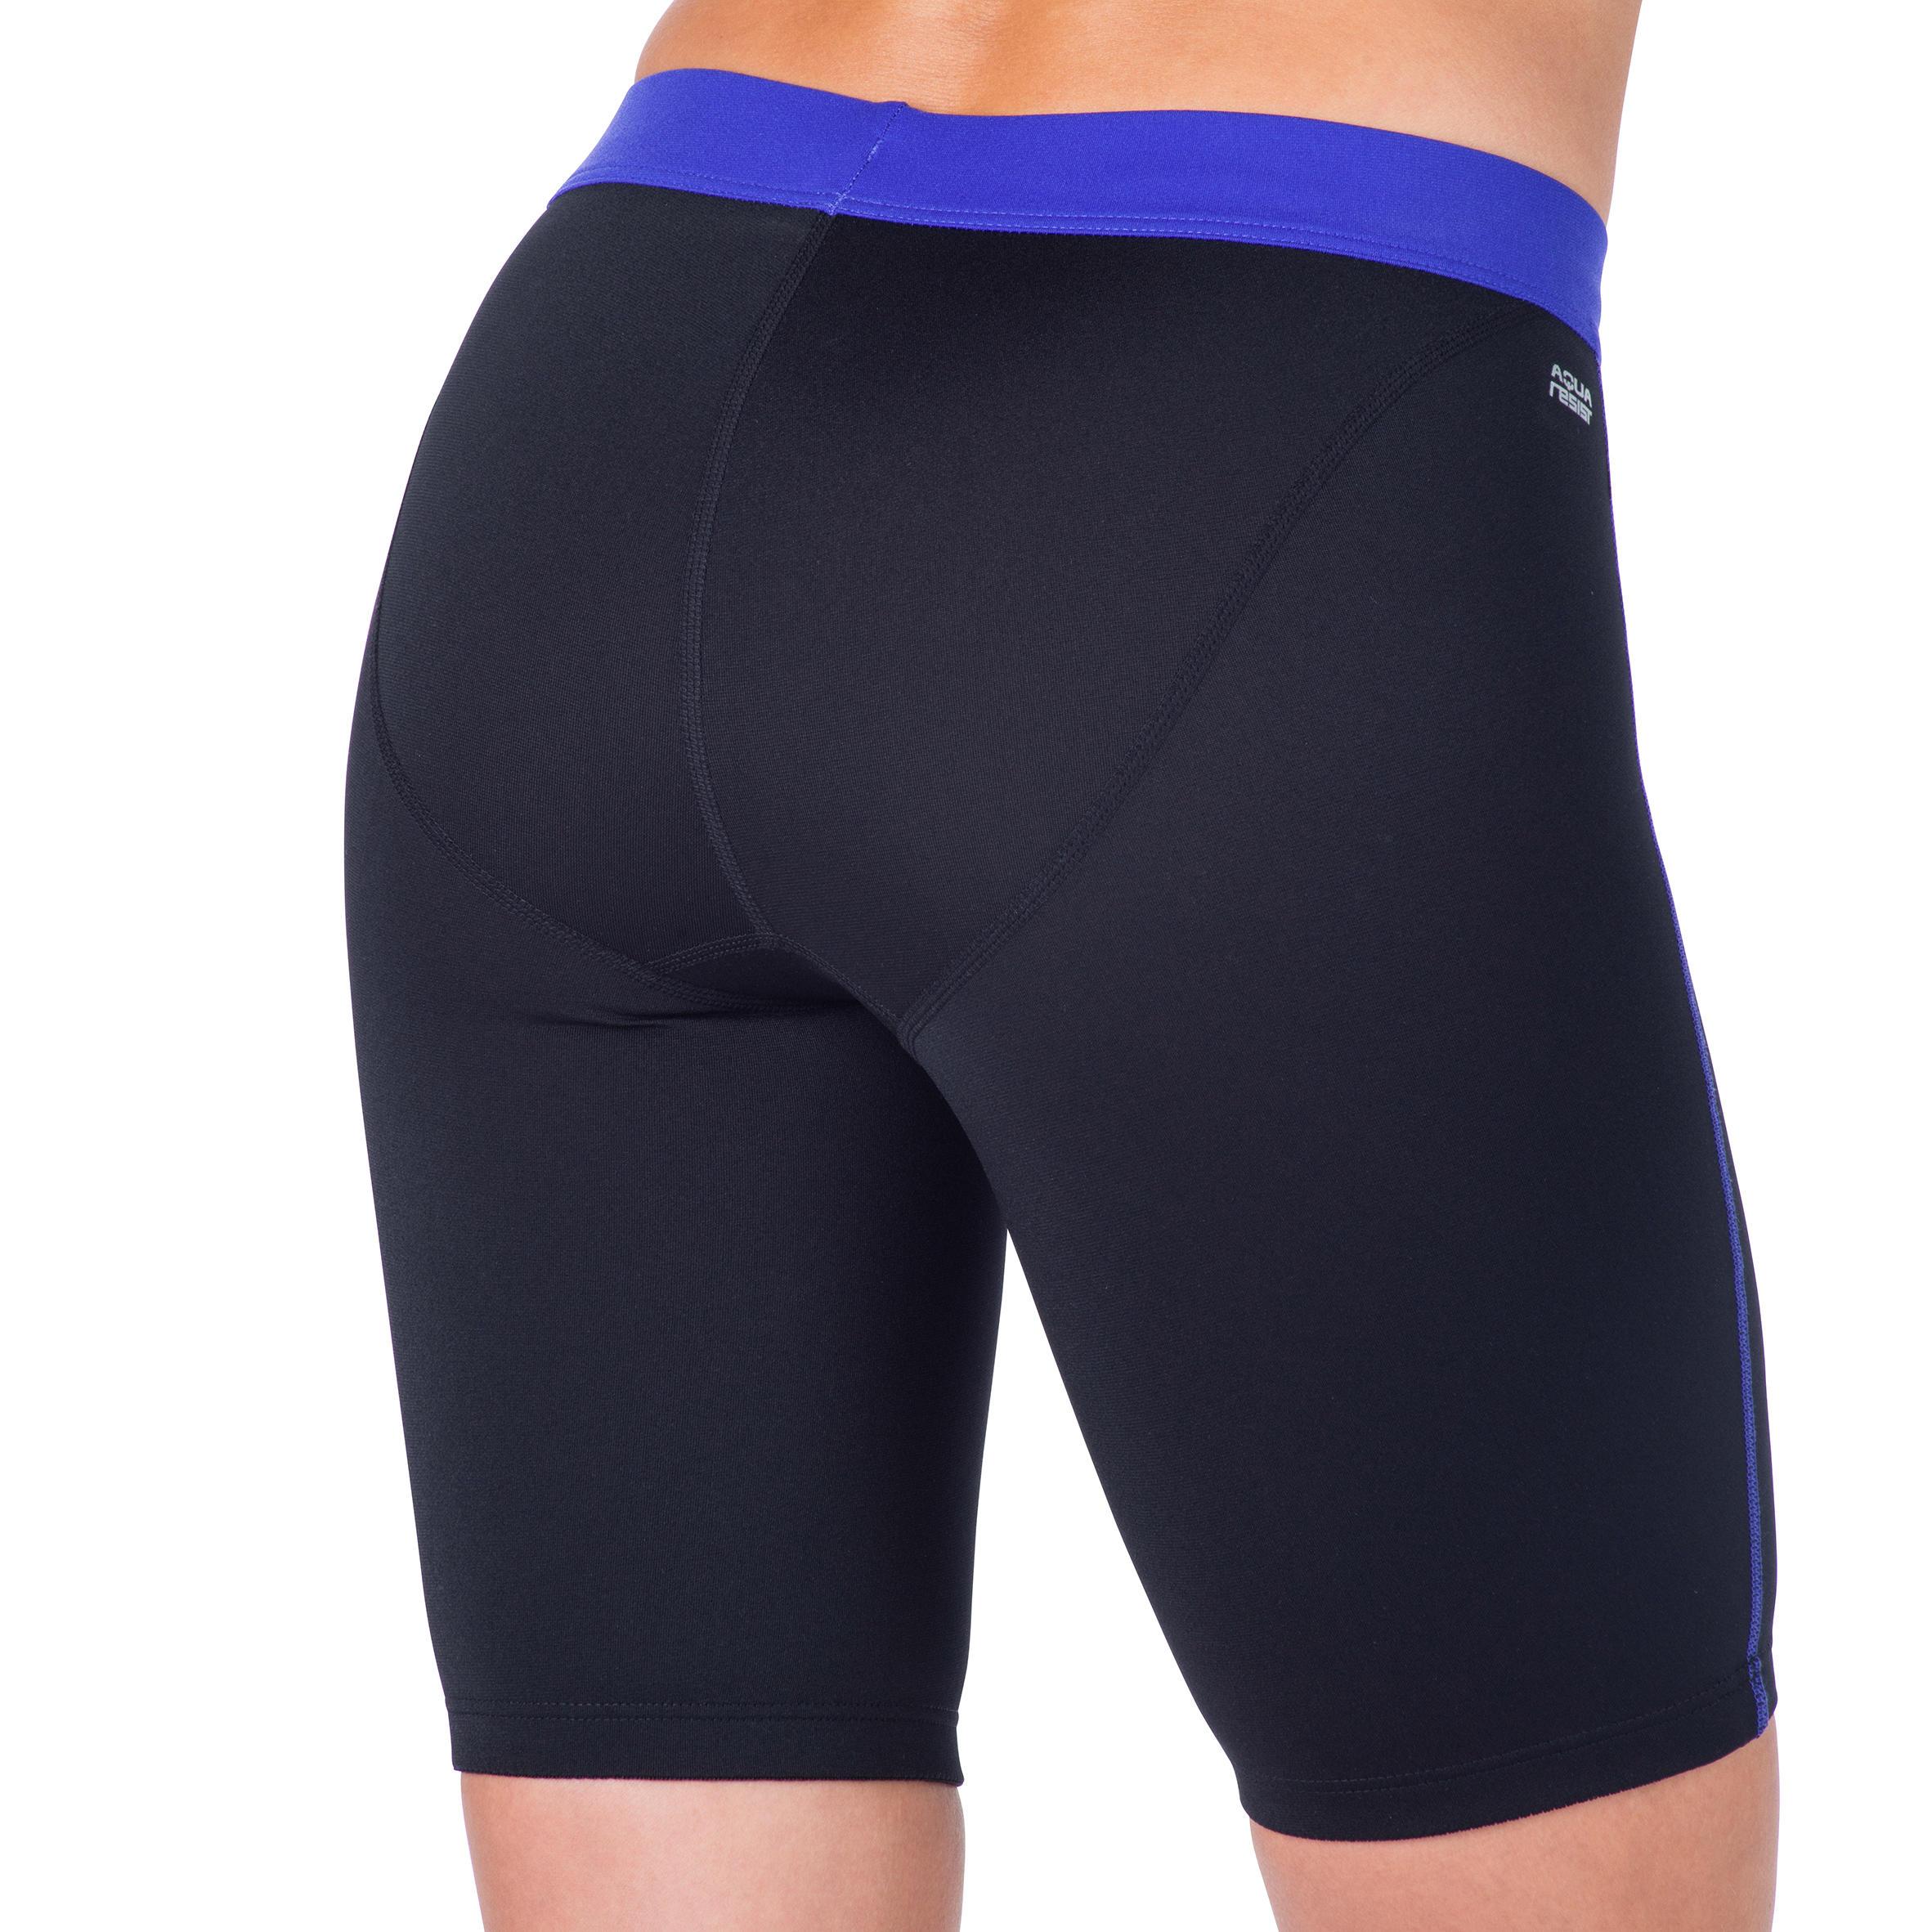 Anna Women's Aquabiking Shorts - Black Blue